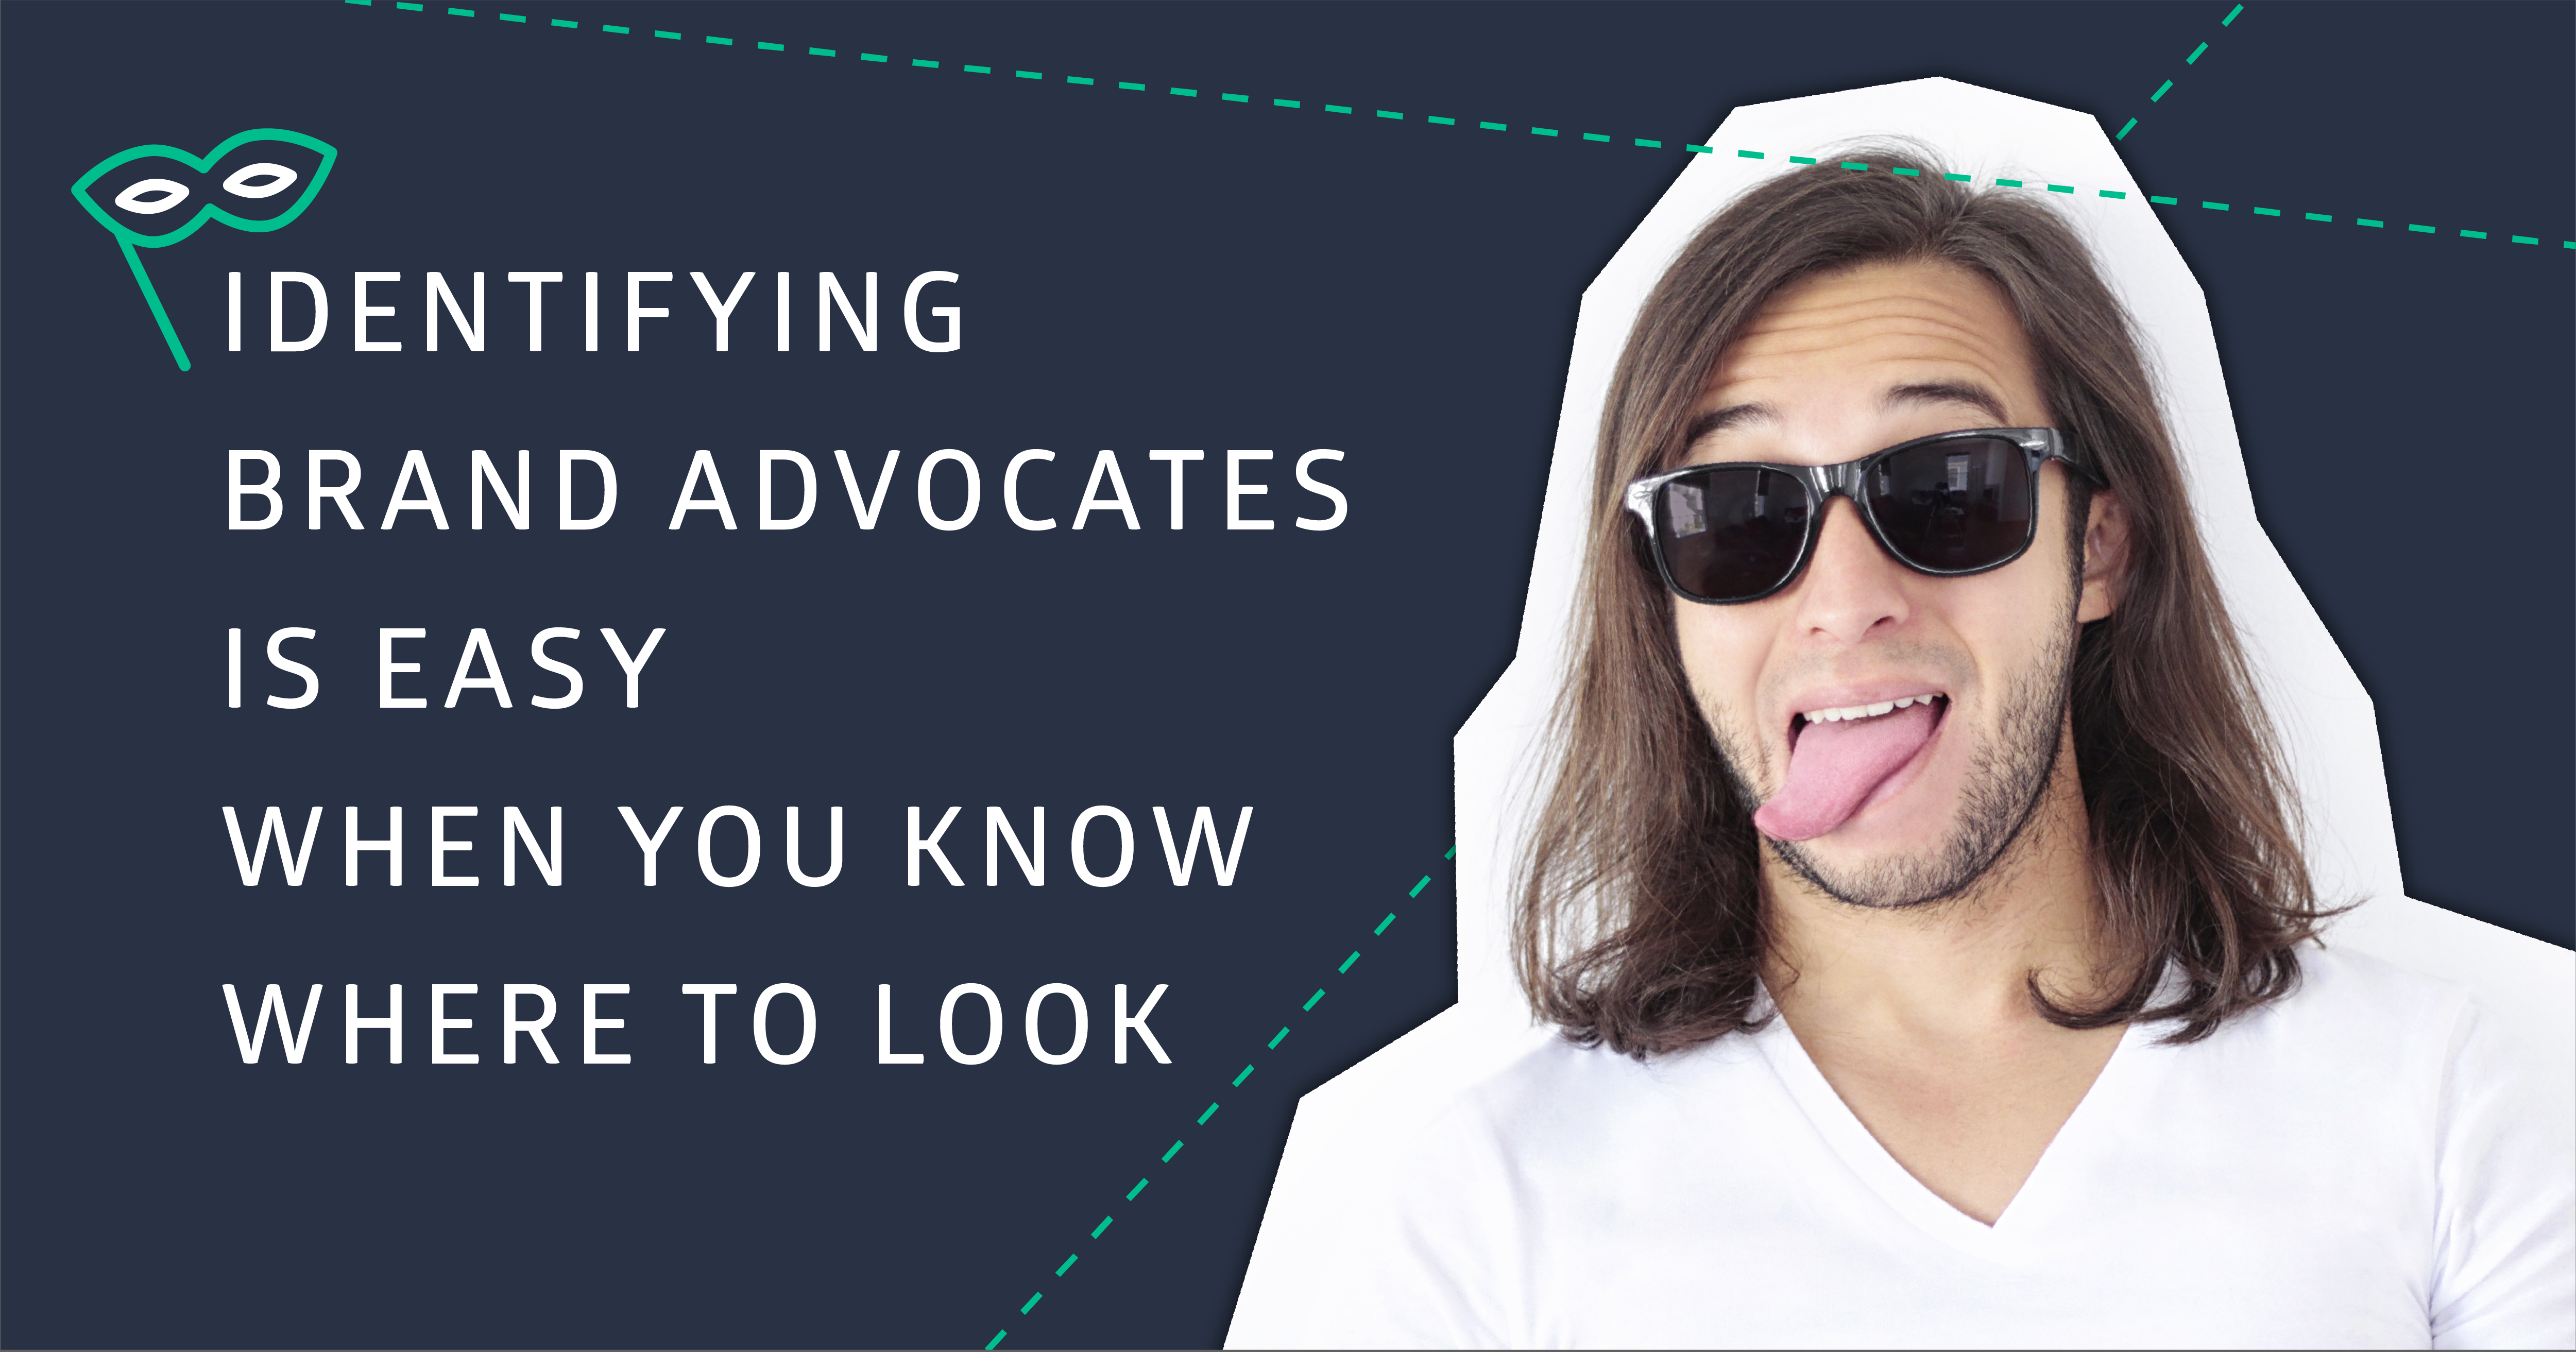 Easily Idenitfy Brand Advocates